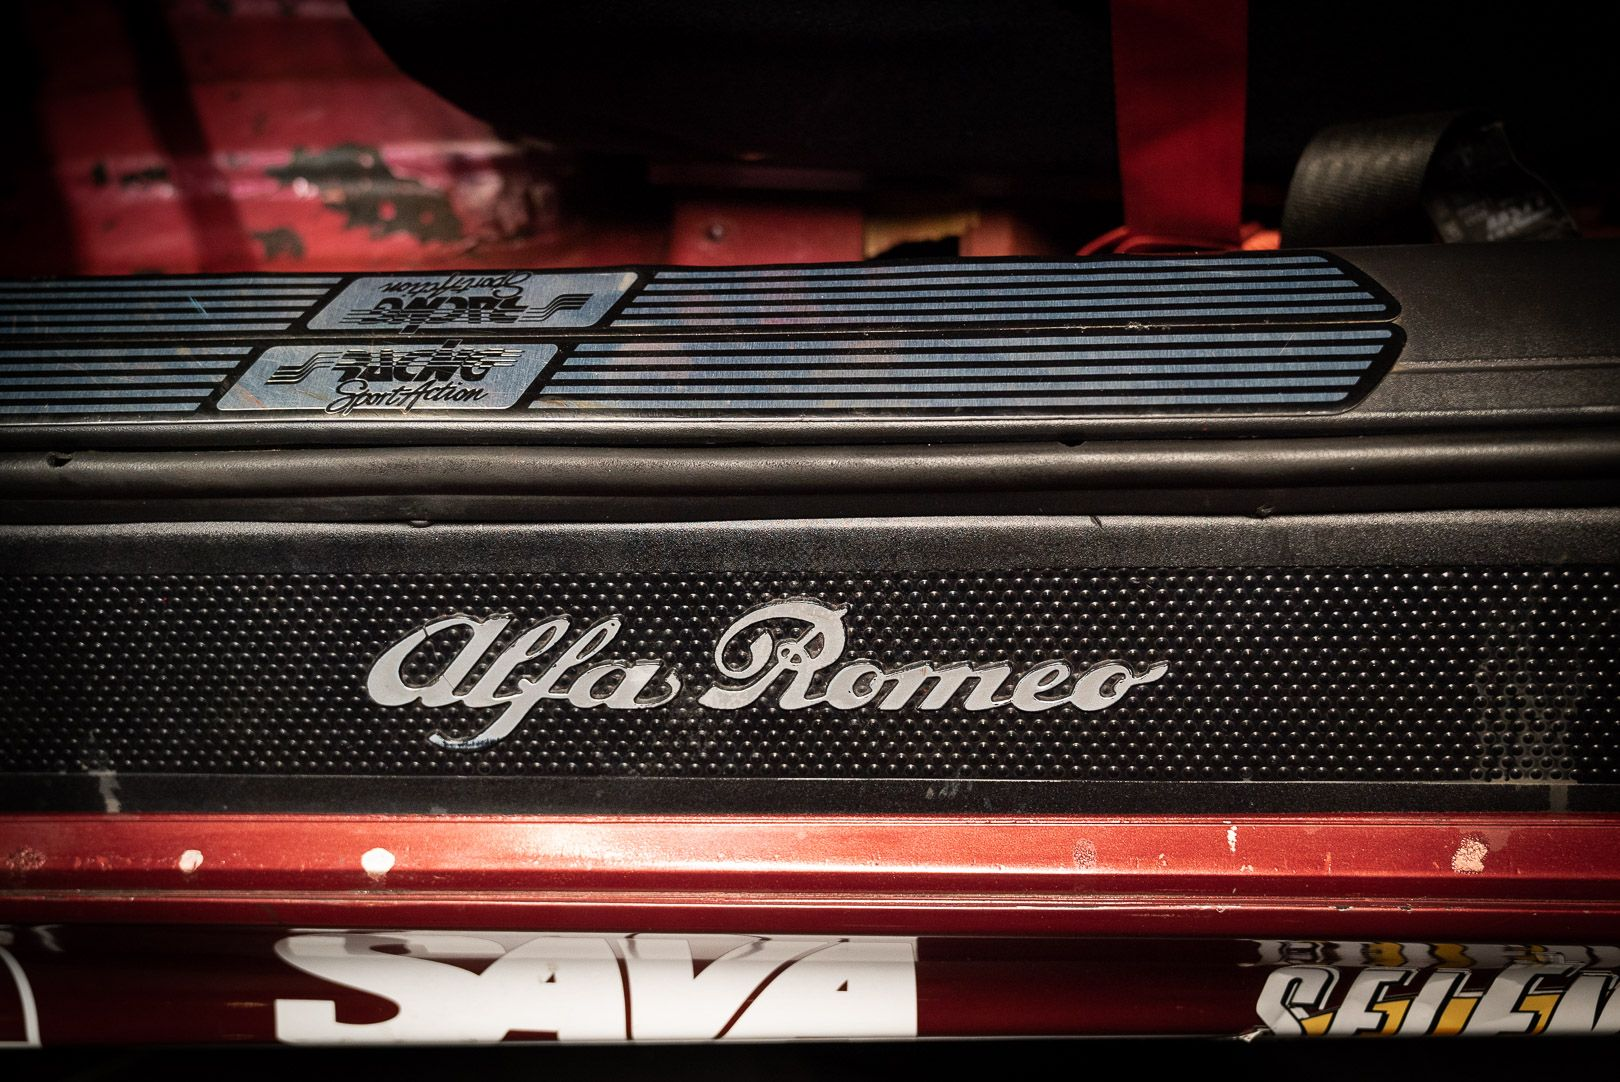 1995 Alfa Romeo GTV 2.0 V6 Turbo Cup Replica 59935